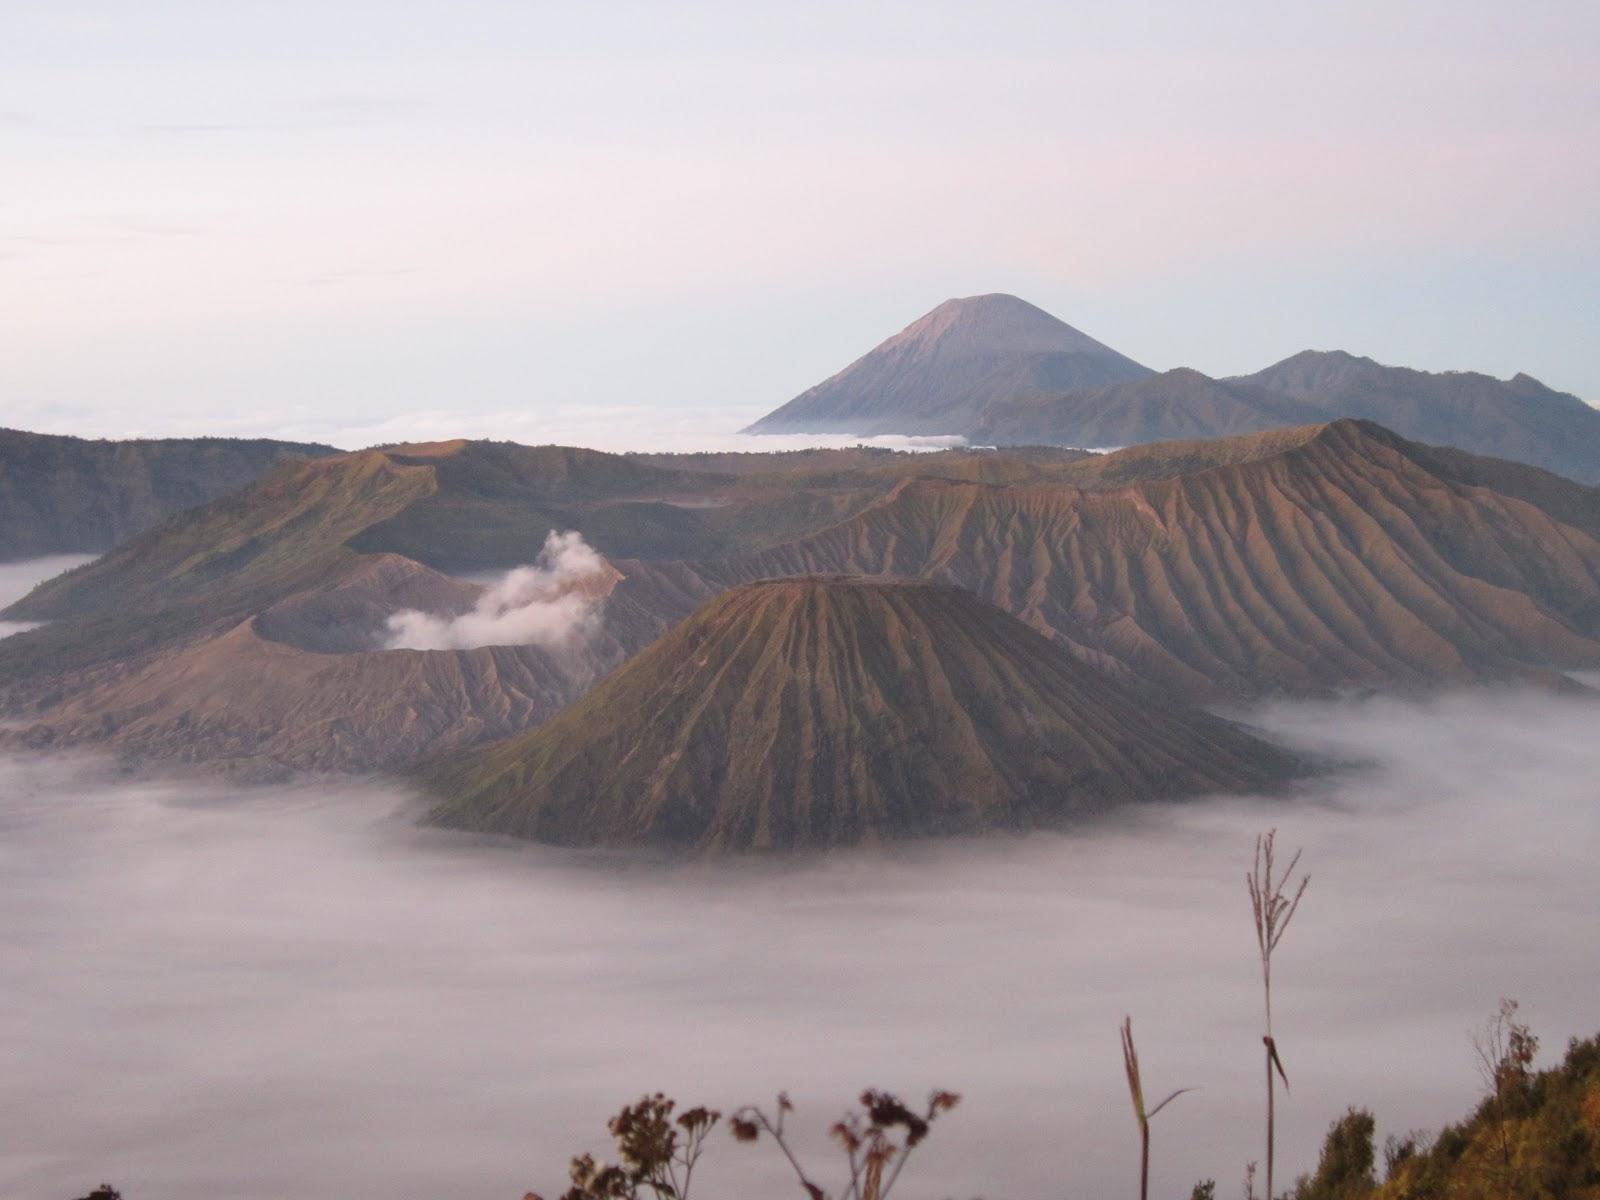 Mount Bromo in Probolinggo